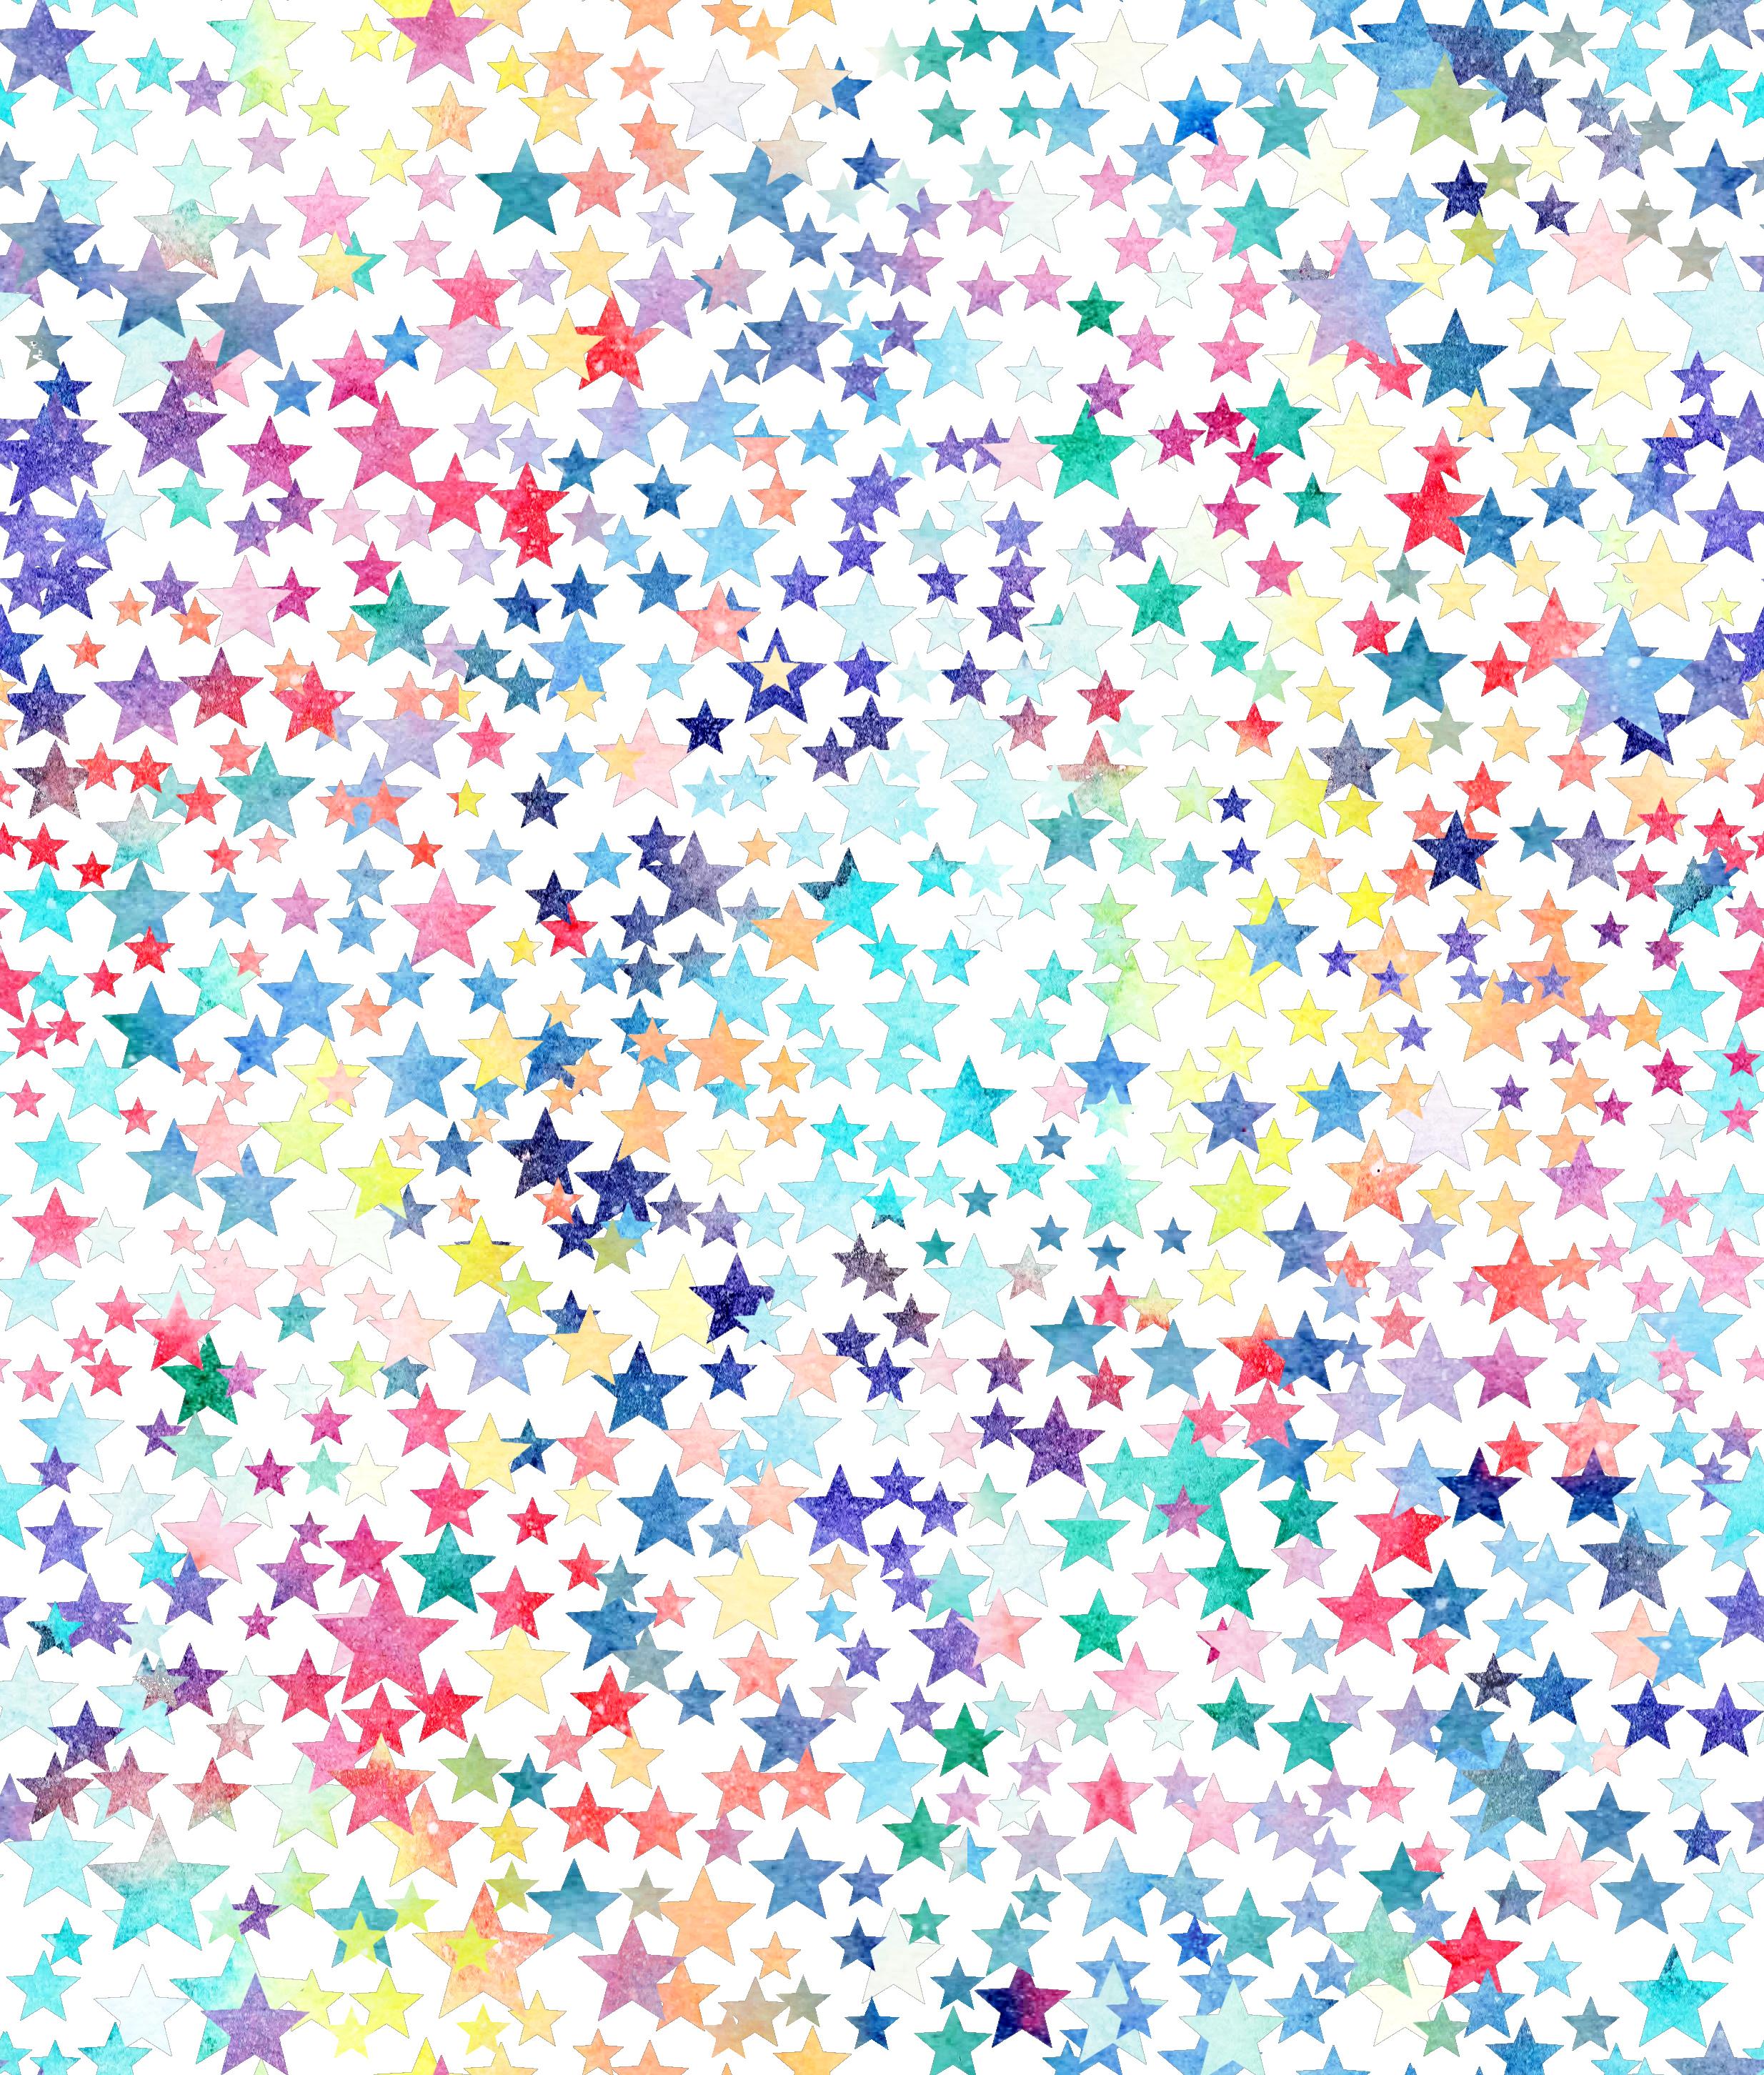 rainbow crowded stars white.jpg